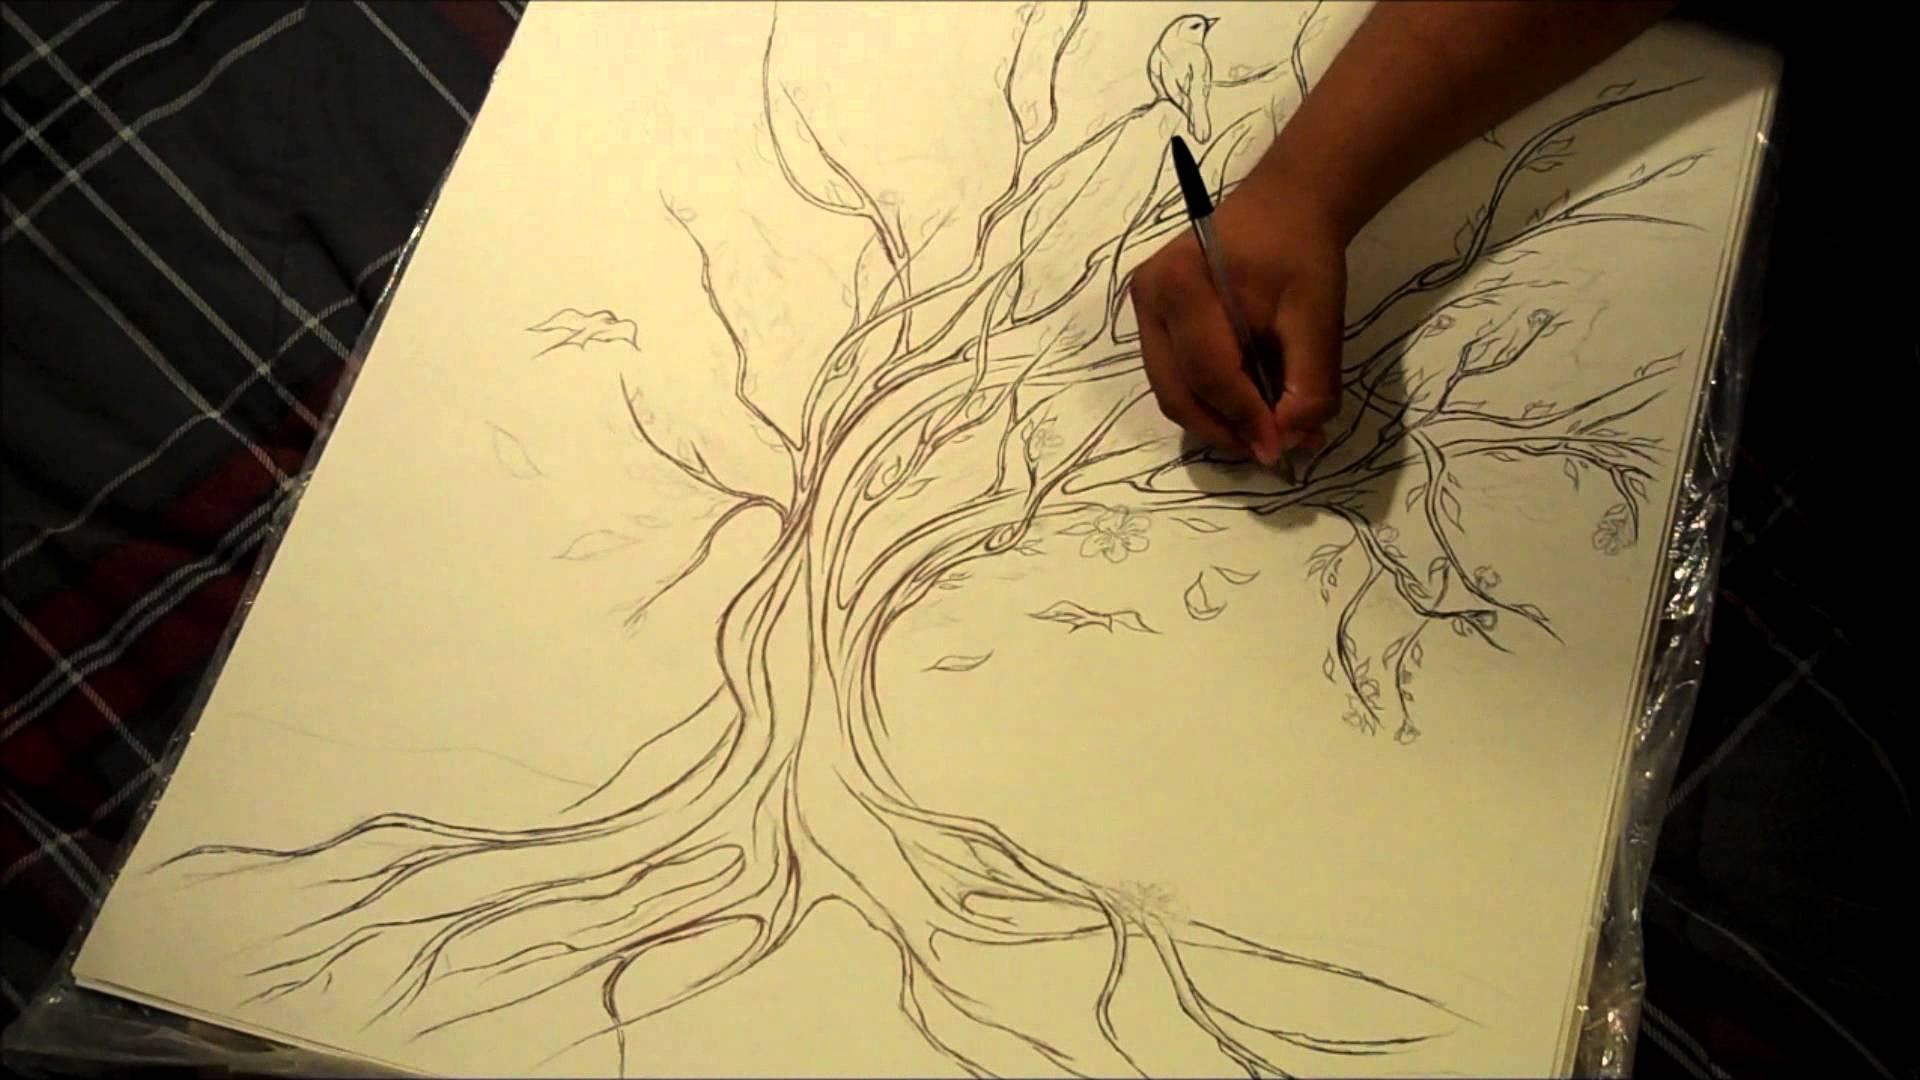 Drawn sakura blossom pencil drawing 2 YouTube Blossom Cherry